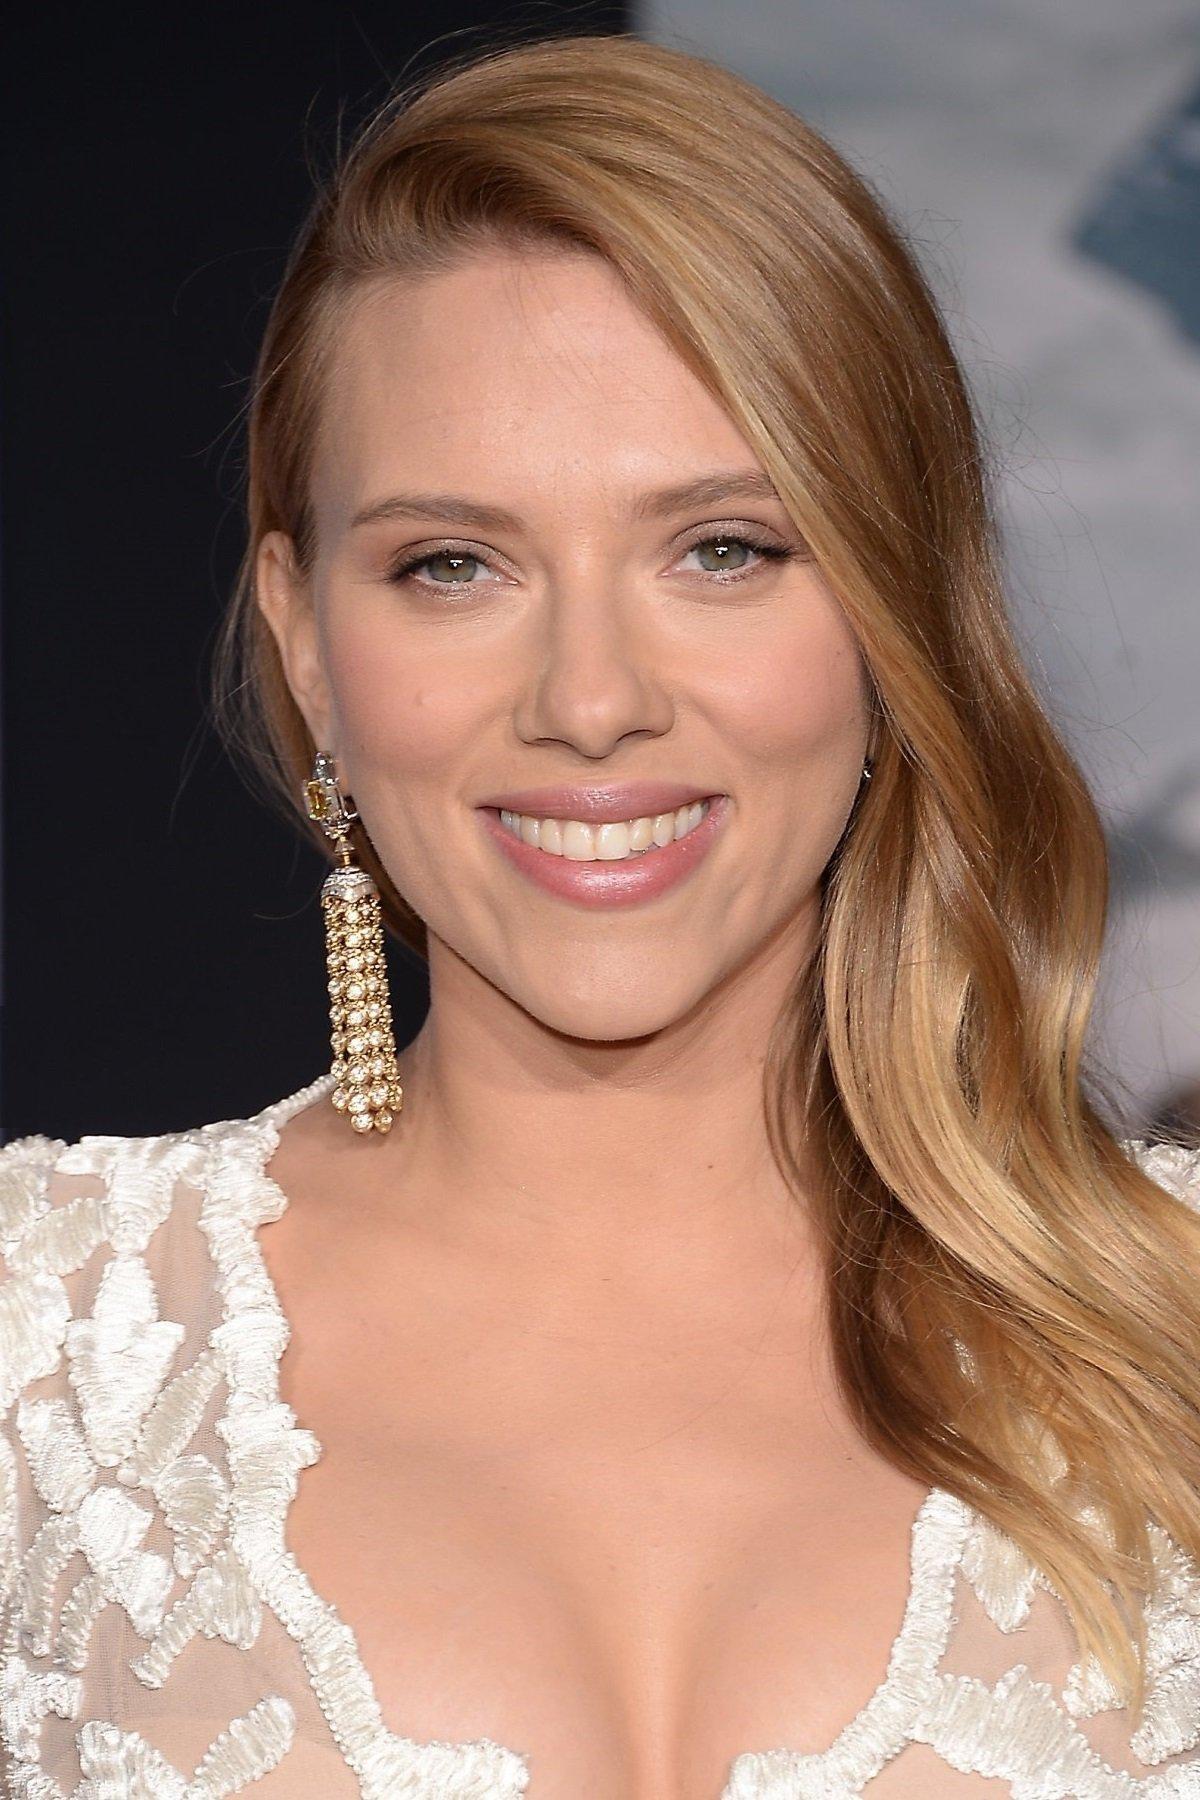 Скарлетт Йоханссон (Scarlett Johansson) - фильмография ... скарлетт йоханссон фильмография